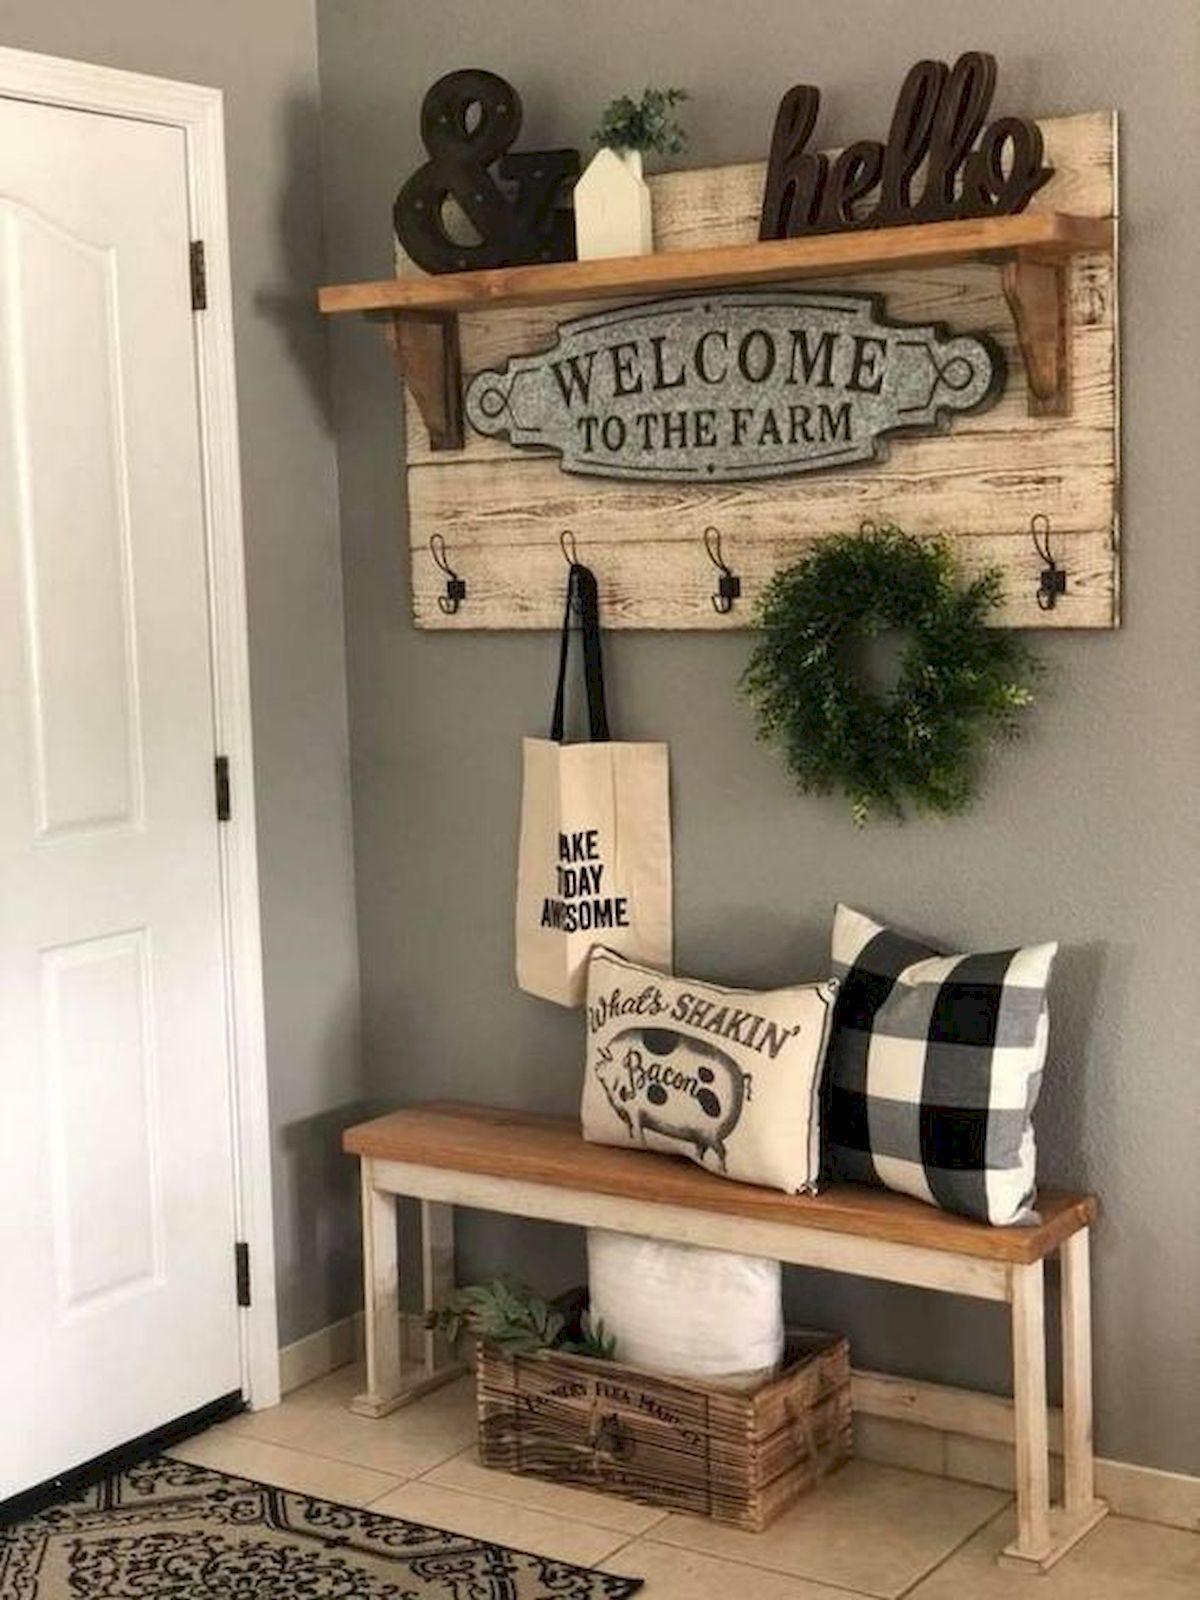 65 Wonderful Diy Rustic Home Decor Ideas 14 Farmhouse Decor